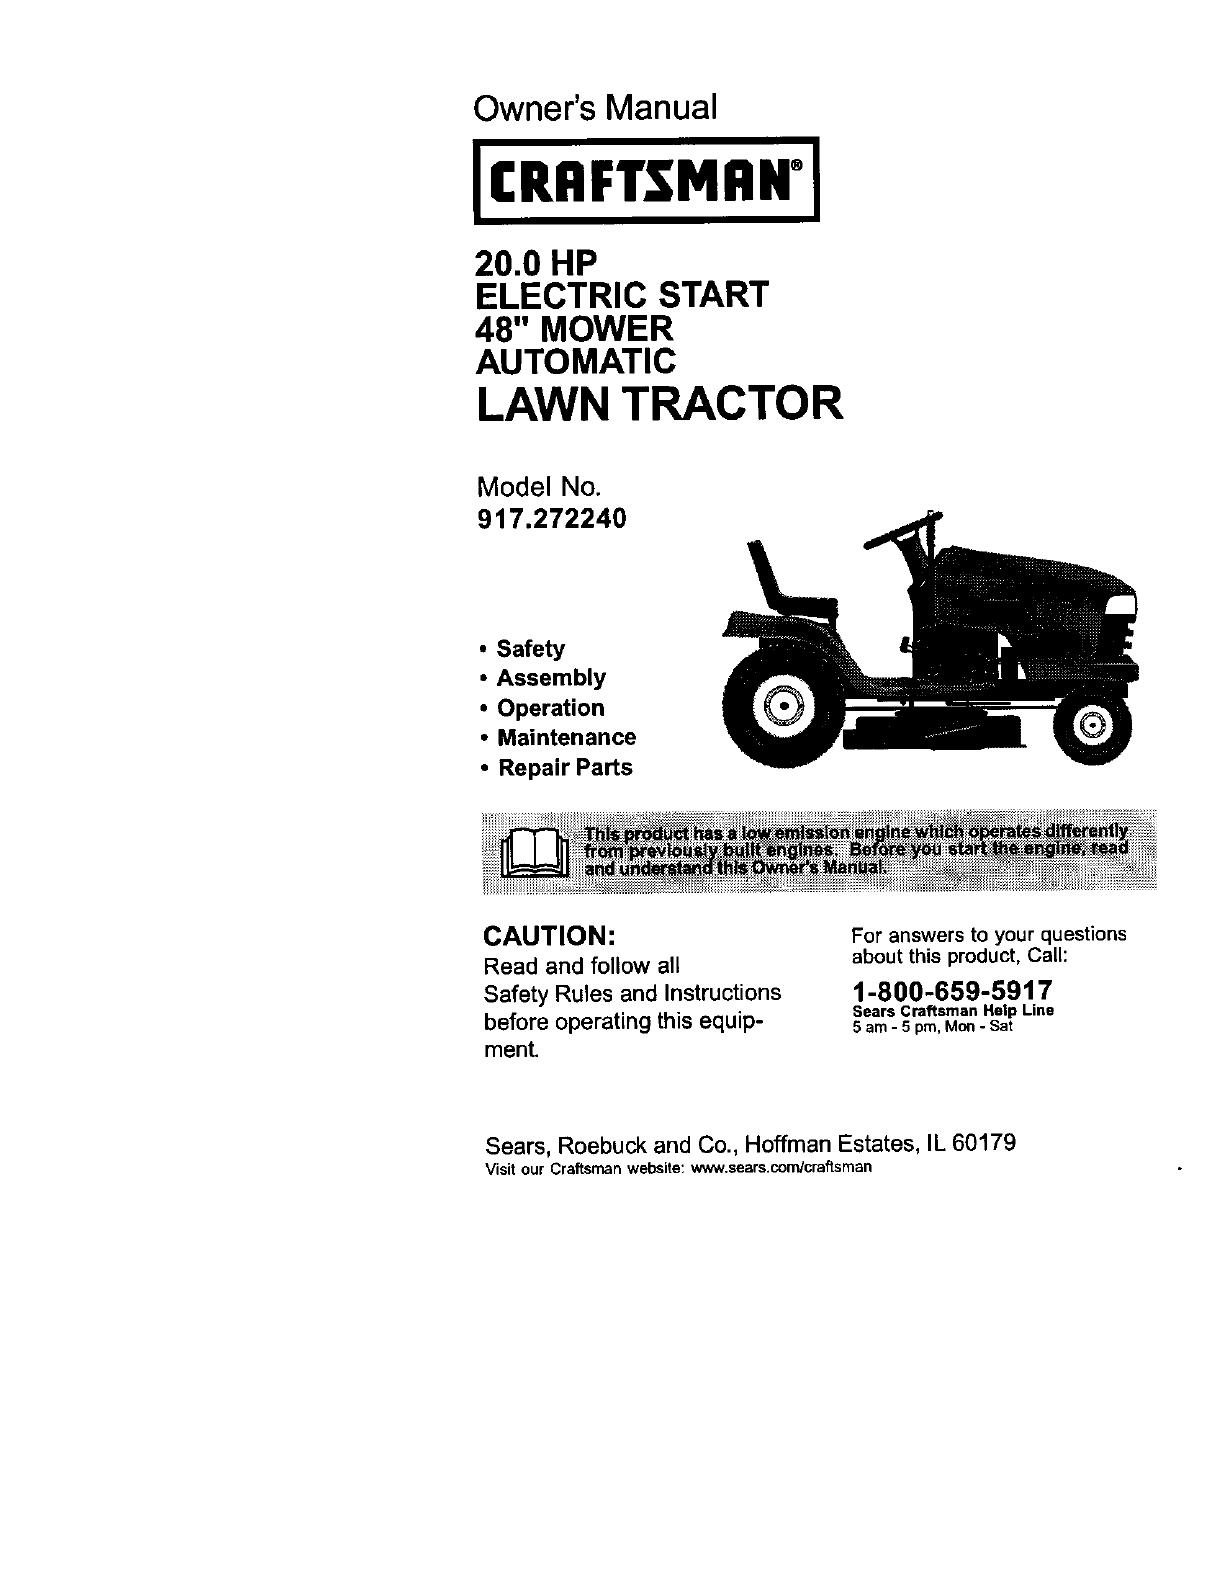 Imgenes De Craftsman Lawn Tractor 917 Owners Manual Wiring Diagram 273761 L0103110